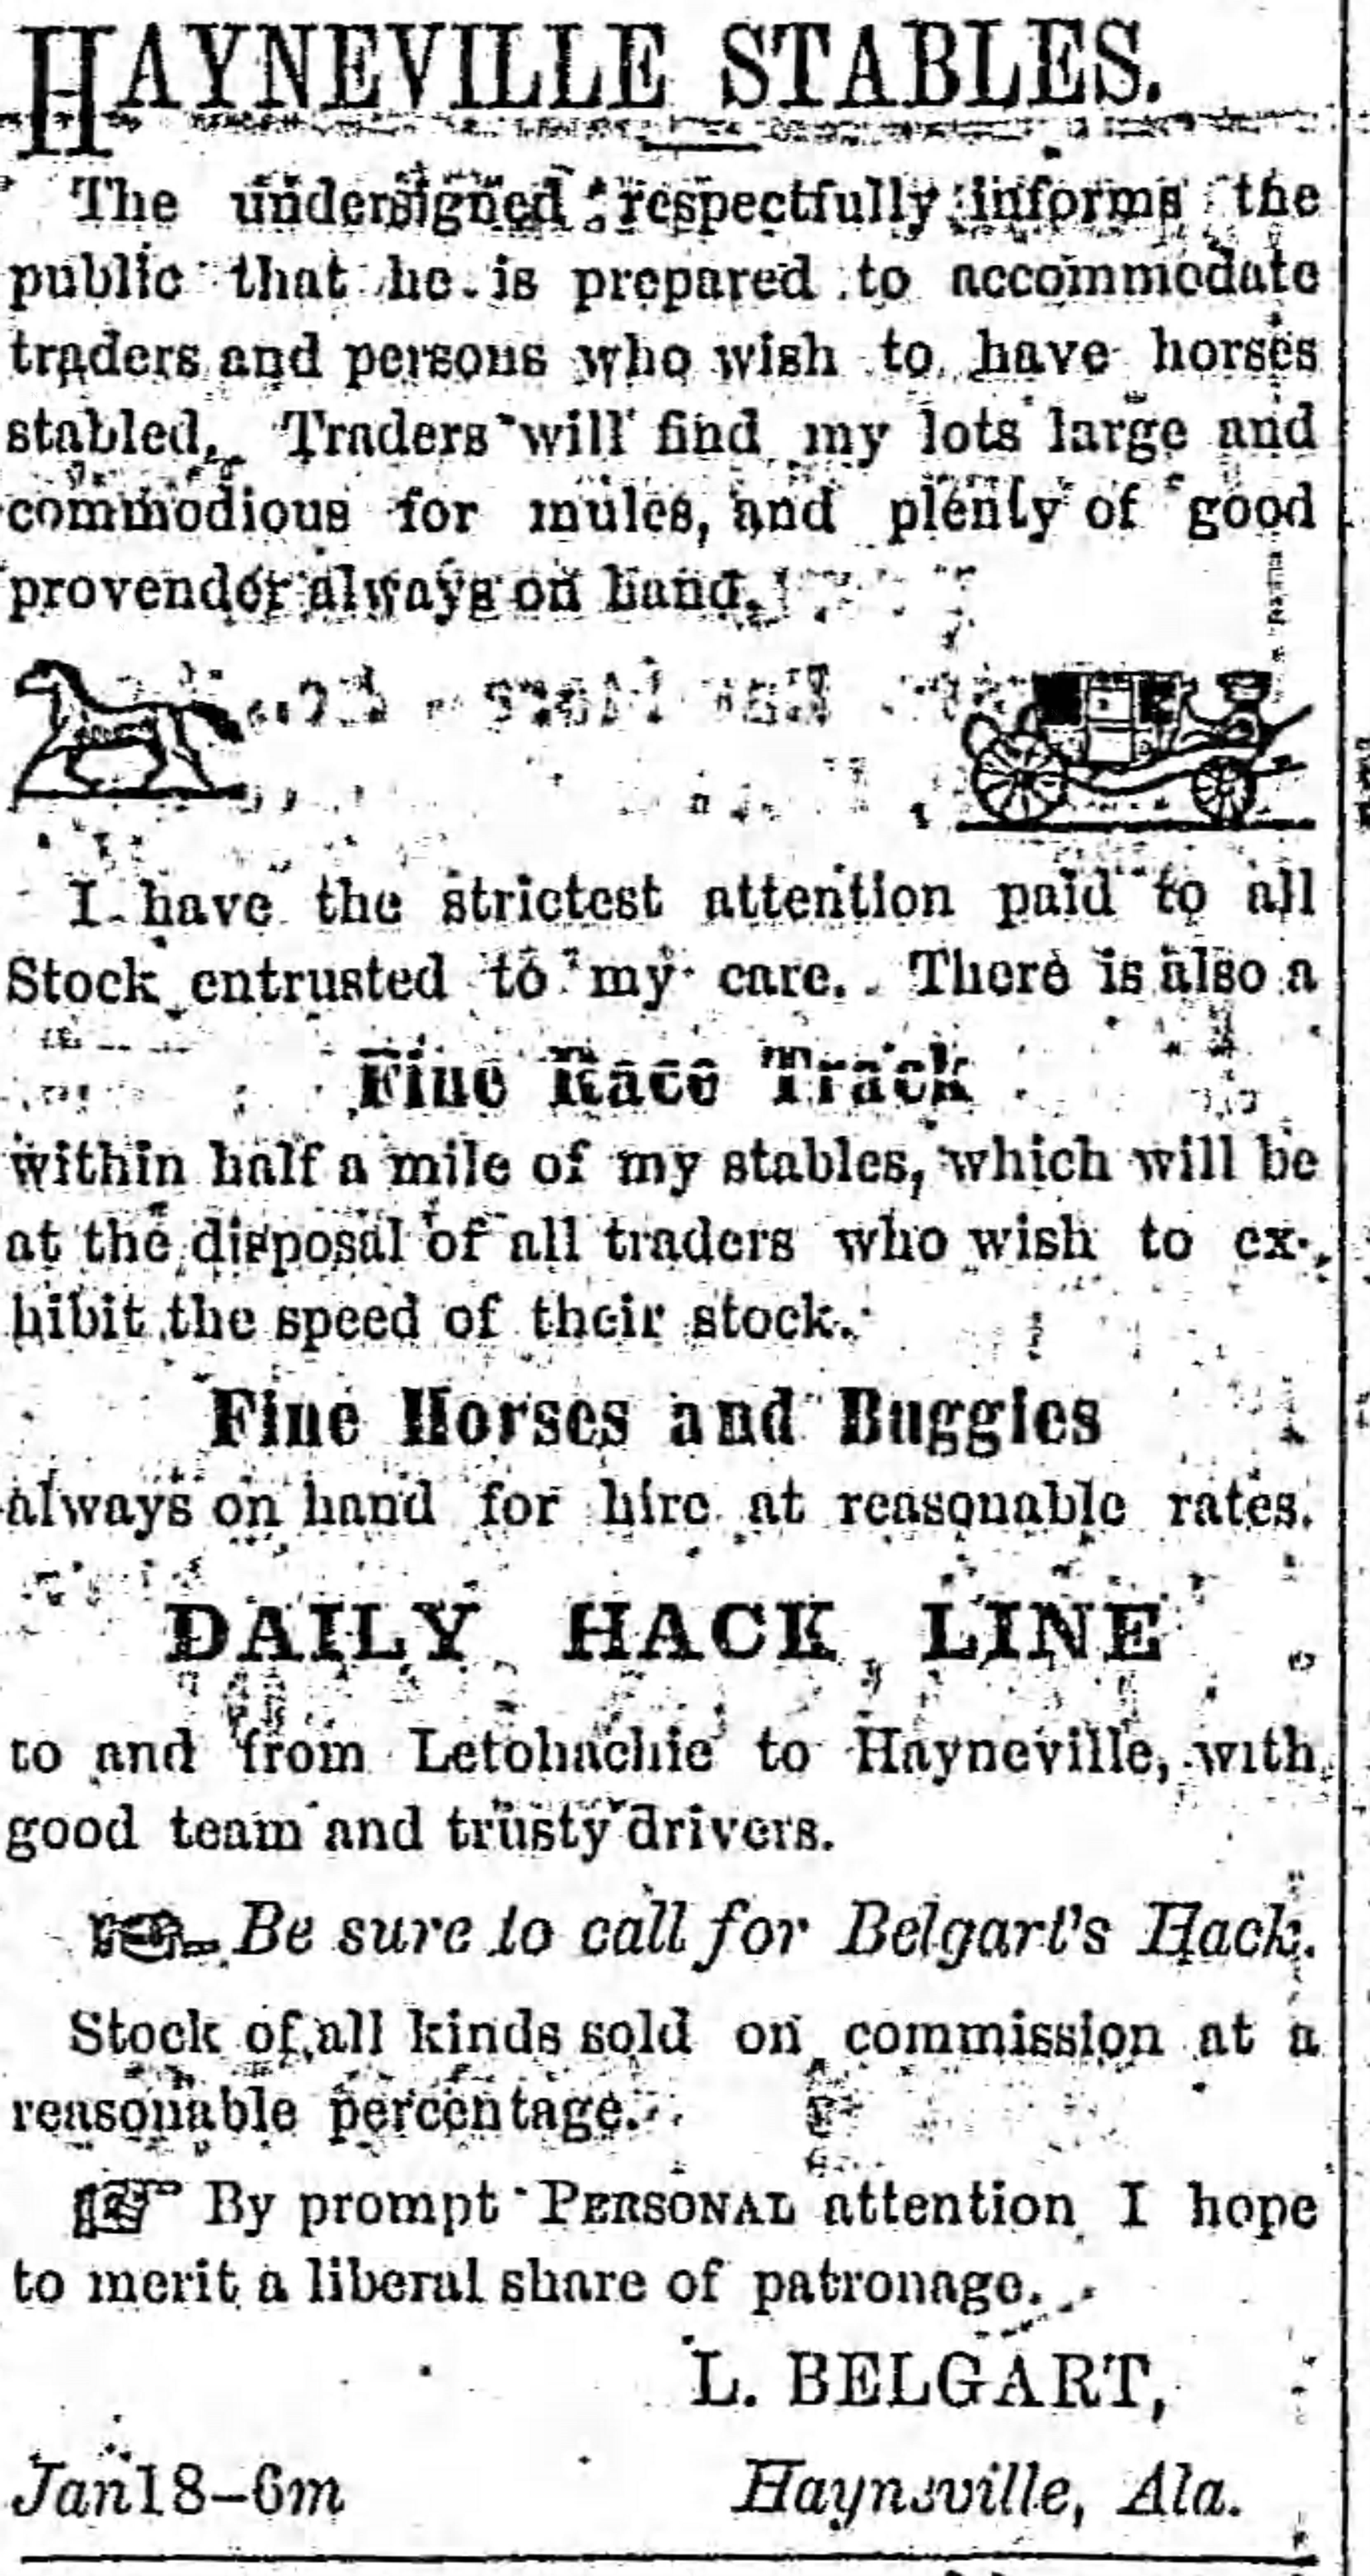 PATRON – Estate Settlements & Sheriff's sales May 31, 1871 around Hayneville, Alabama